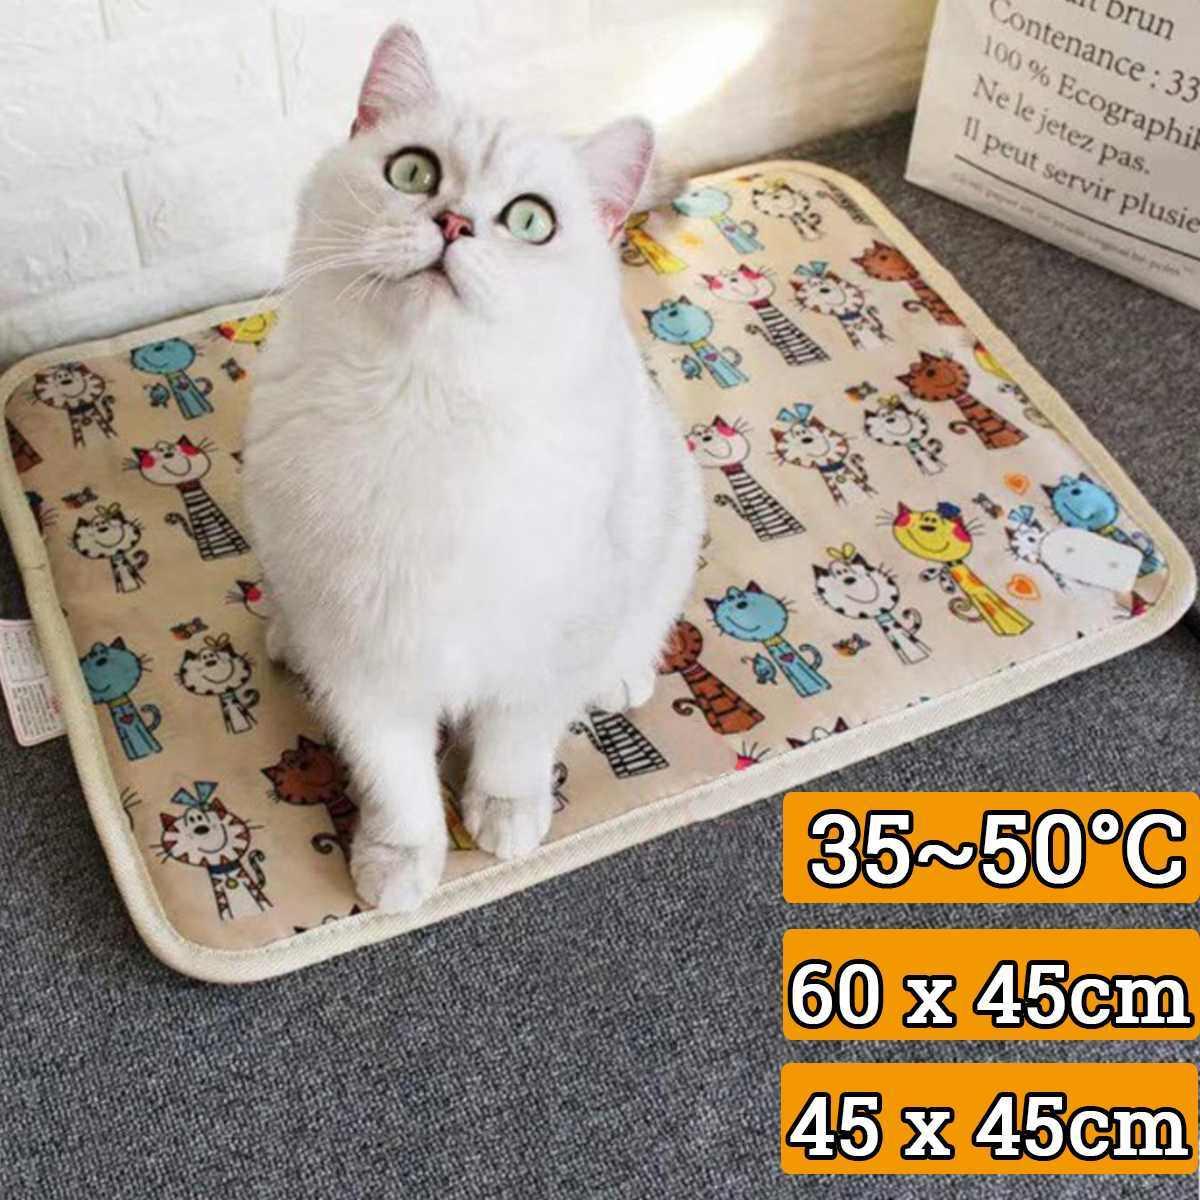 Pet Heater Mat 40-60 Deg. Temperature Control Products Waterproof Pet Heated Warmer Pad Anti Scratch Cat Dog Heater 220V 20/25W